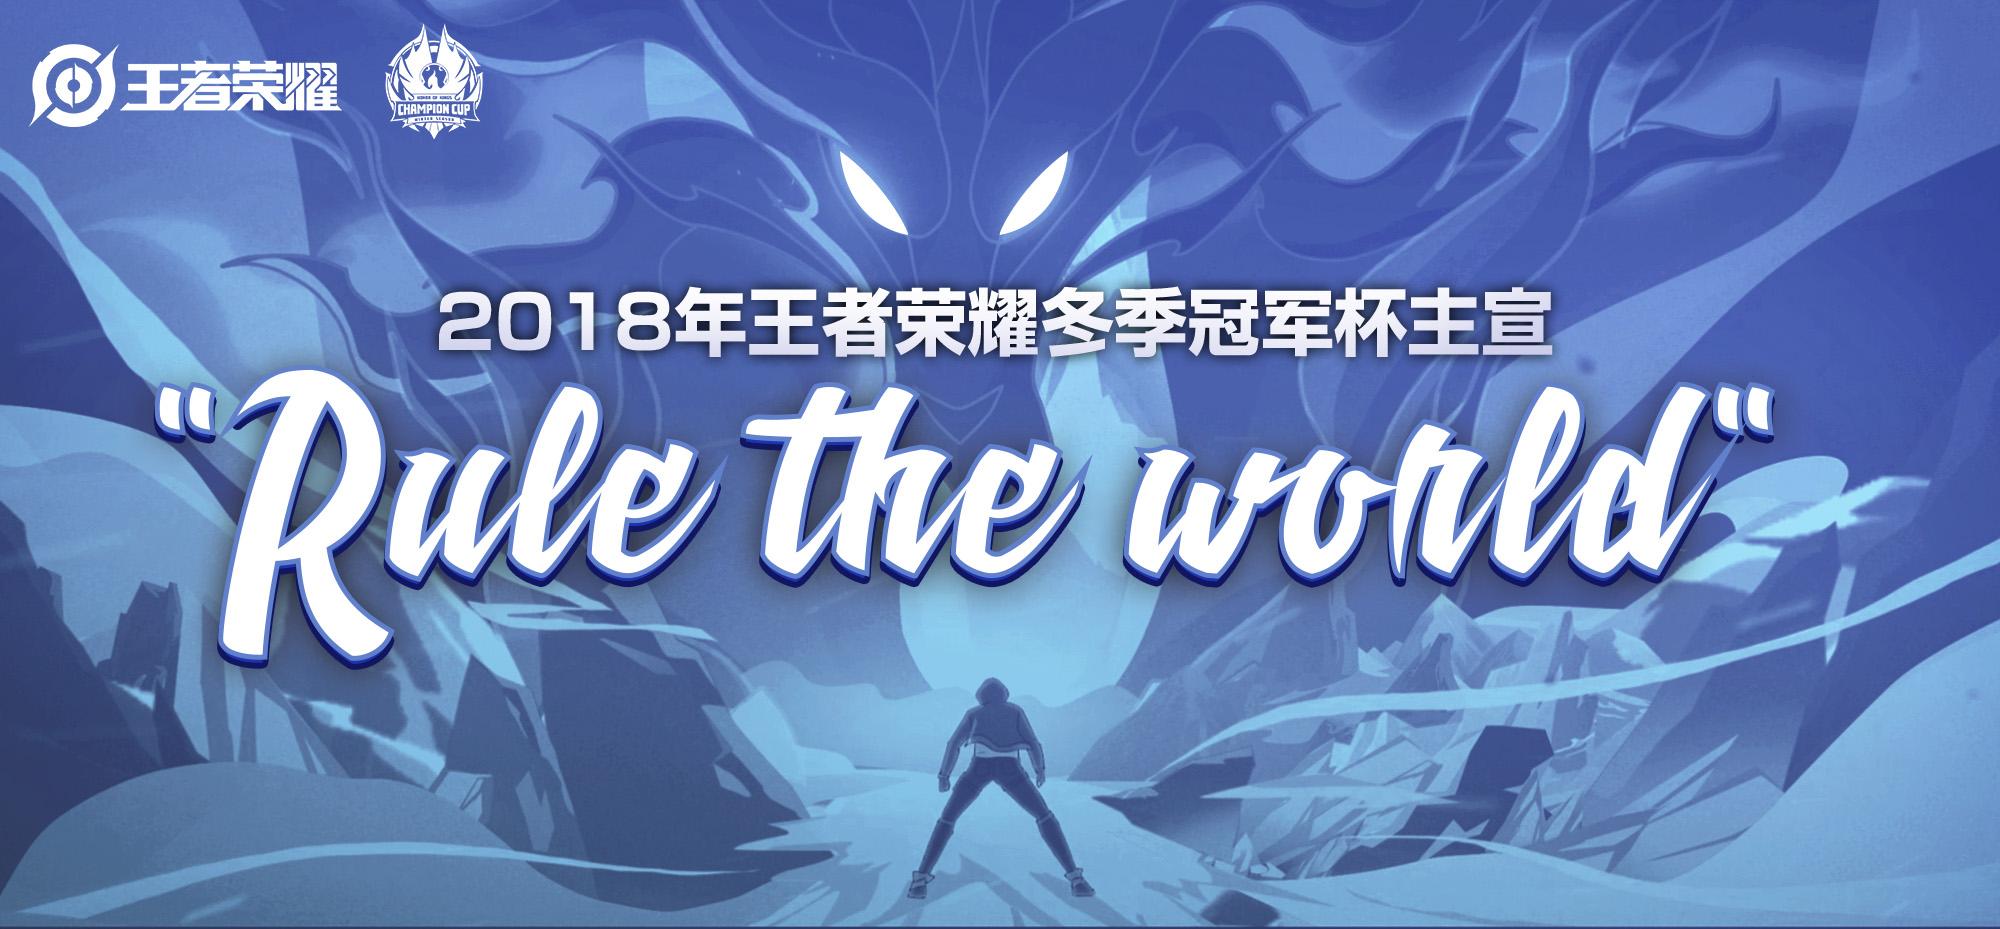 2018冬季冠军杯主宣传片Rule the World